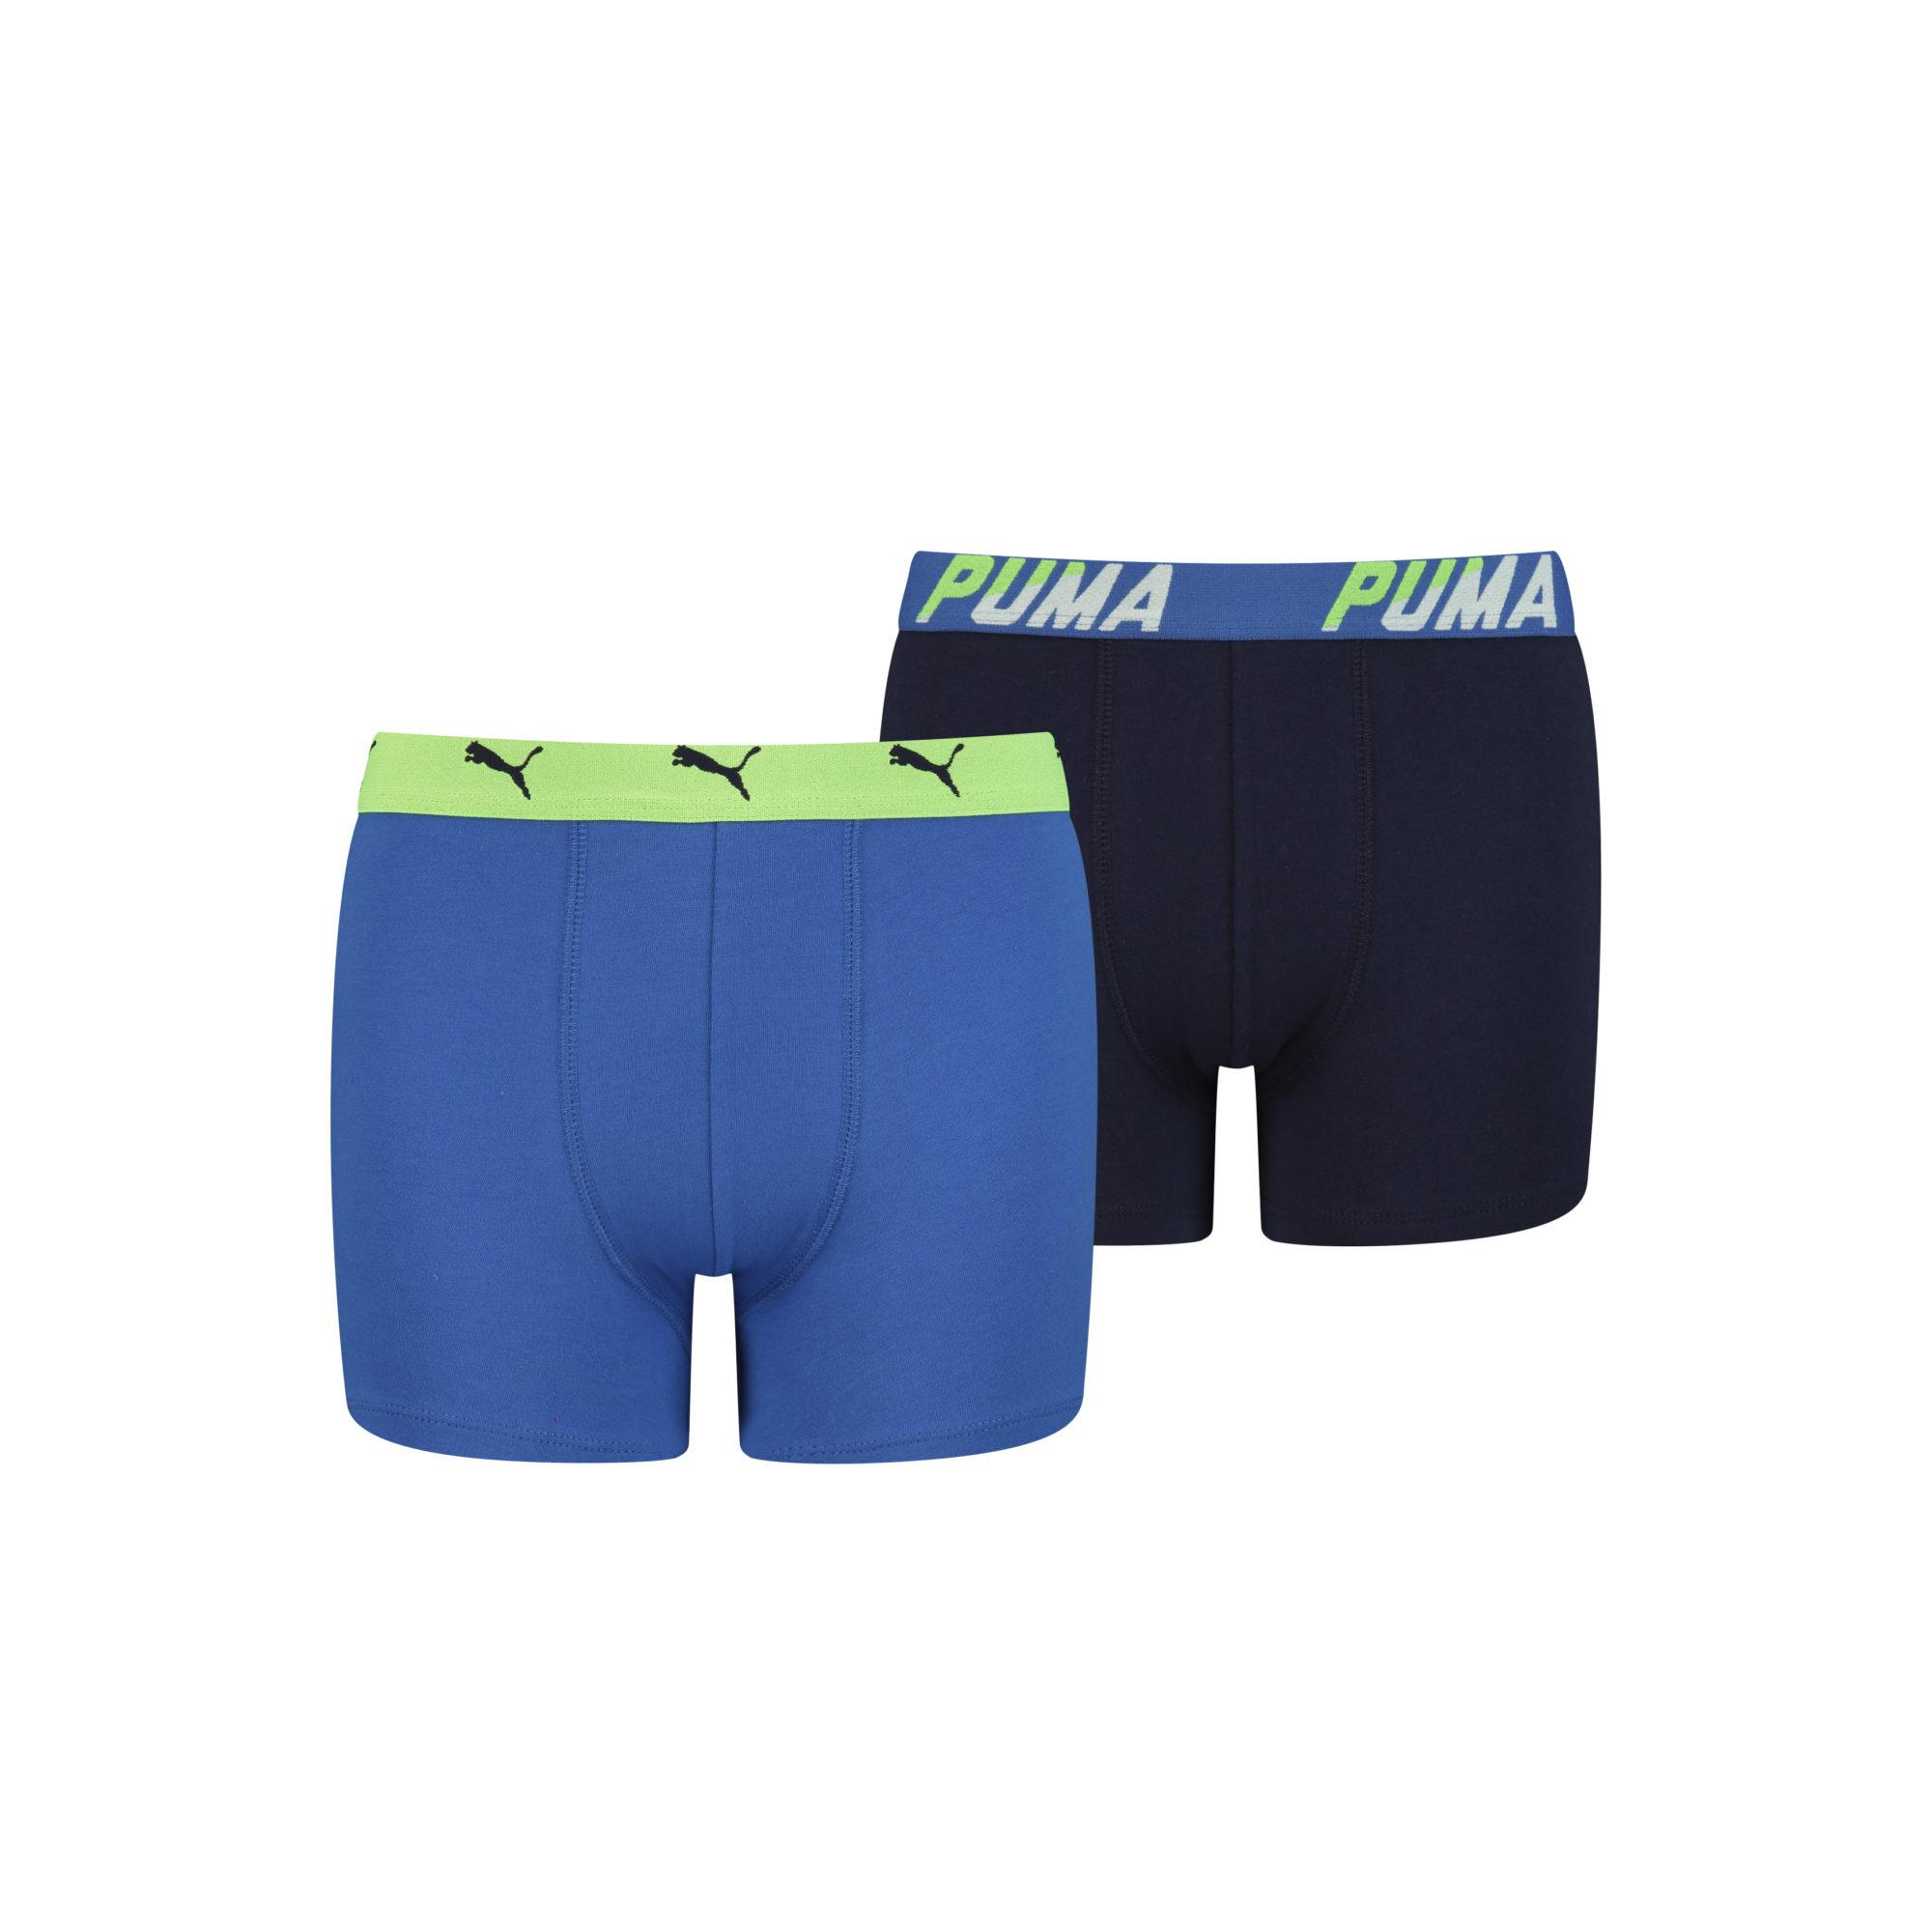 Puma Basic Jongensboxershort duopack